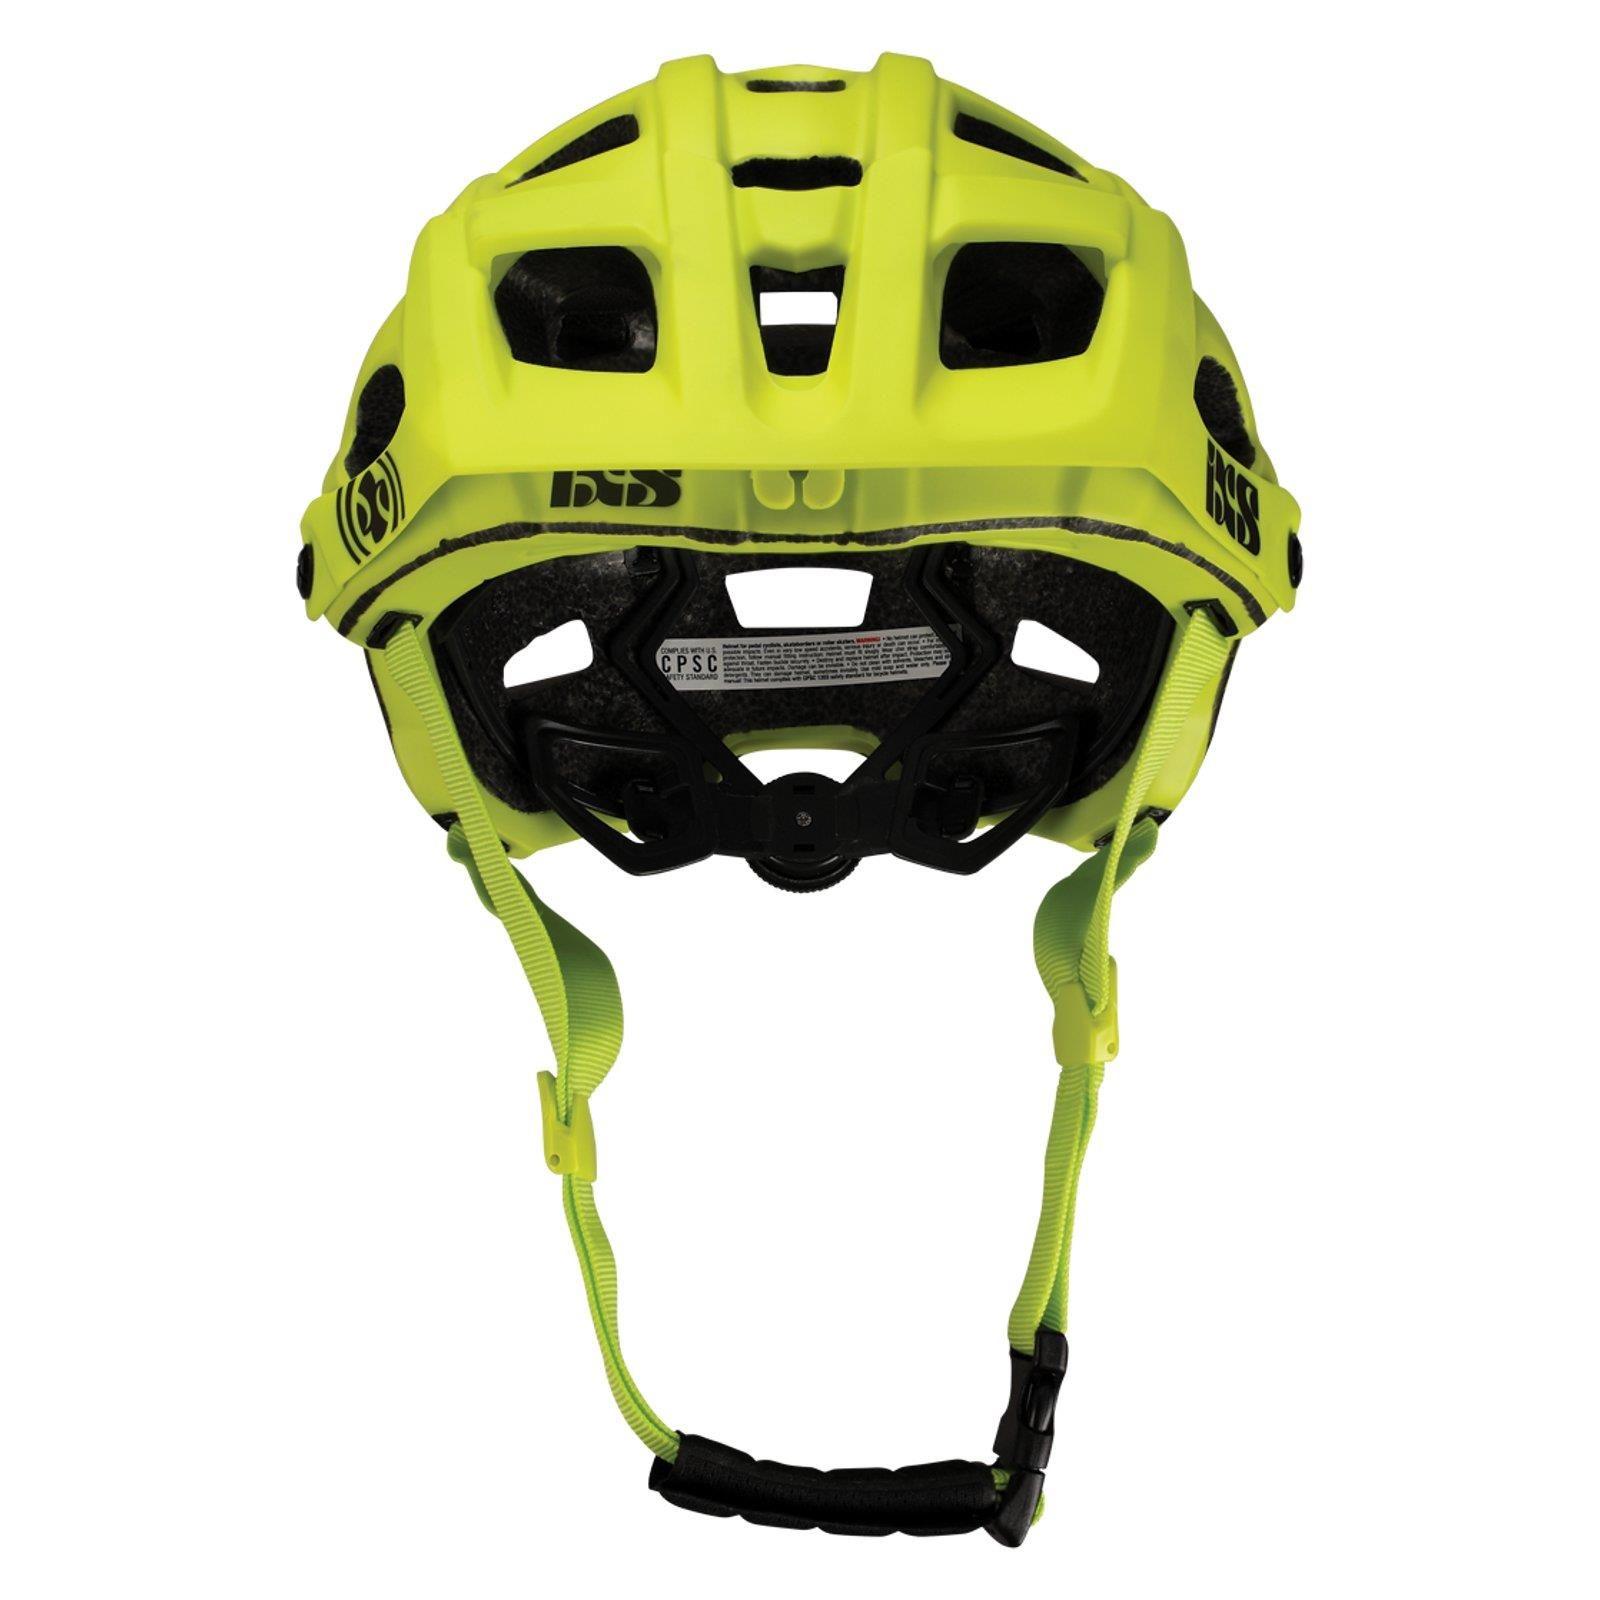 Ixs Trail Rs Evo Fahrrad Helm All Mountain Bike Am Mtb Enduro Dh Downhill Inmold Enduro Mtb All Mountain Bike Mountain Biking